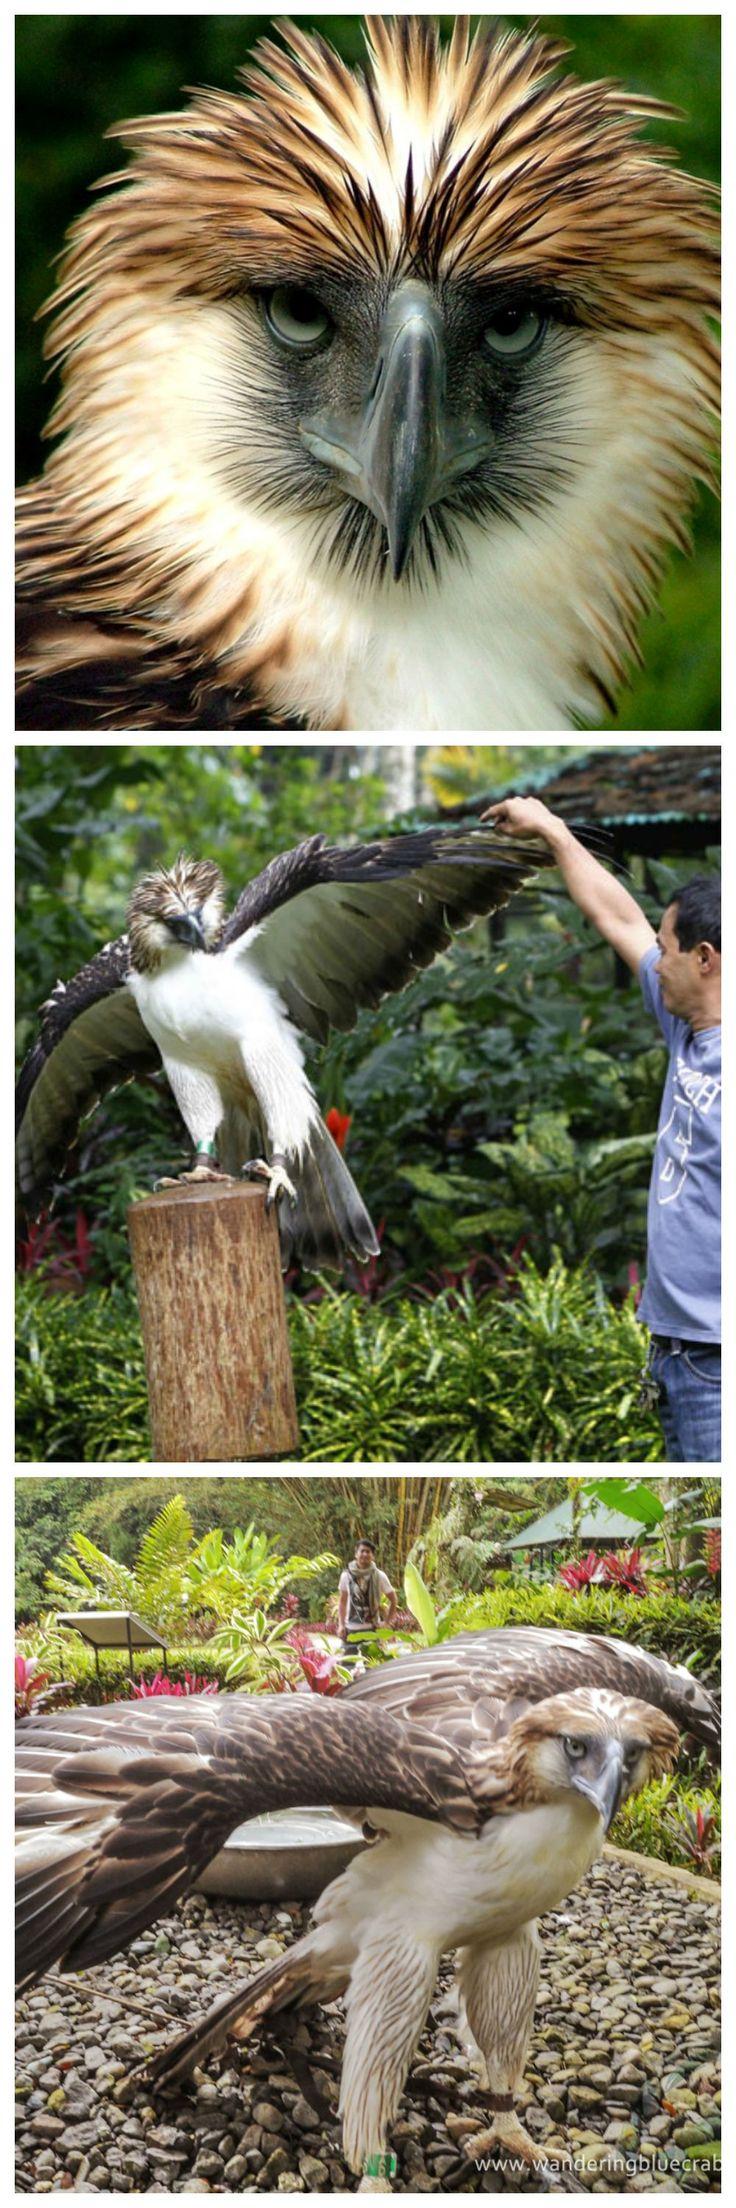 Philippine Eagle, aka monkey-eating eagle. That's one big, beautiful bird!